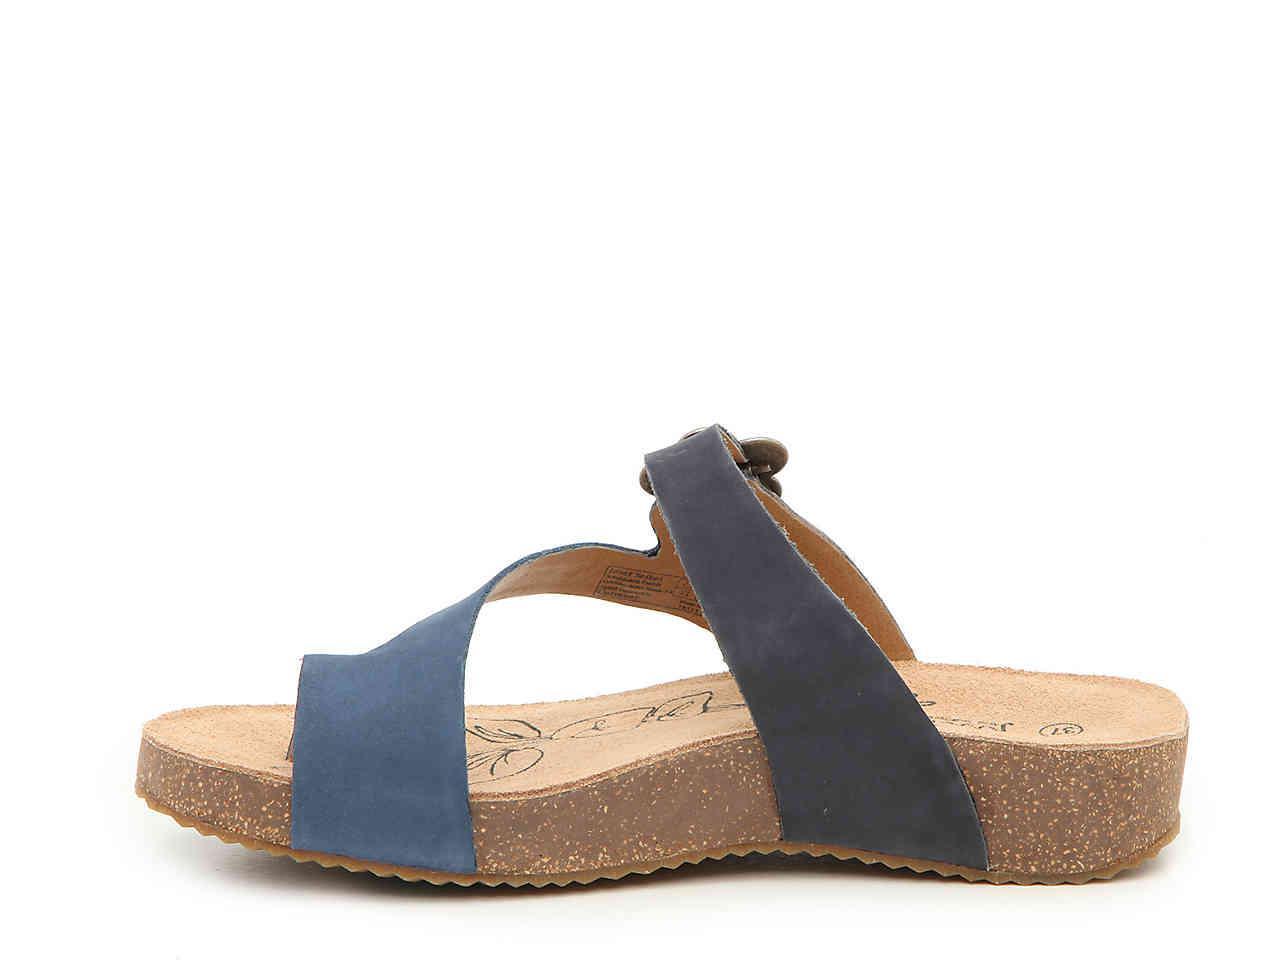 220d9ef0f8fe6 Josef Seibel Tonga 23 Wedge Sandal in Blue - Lyst